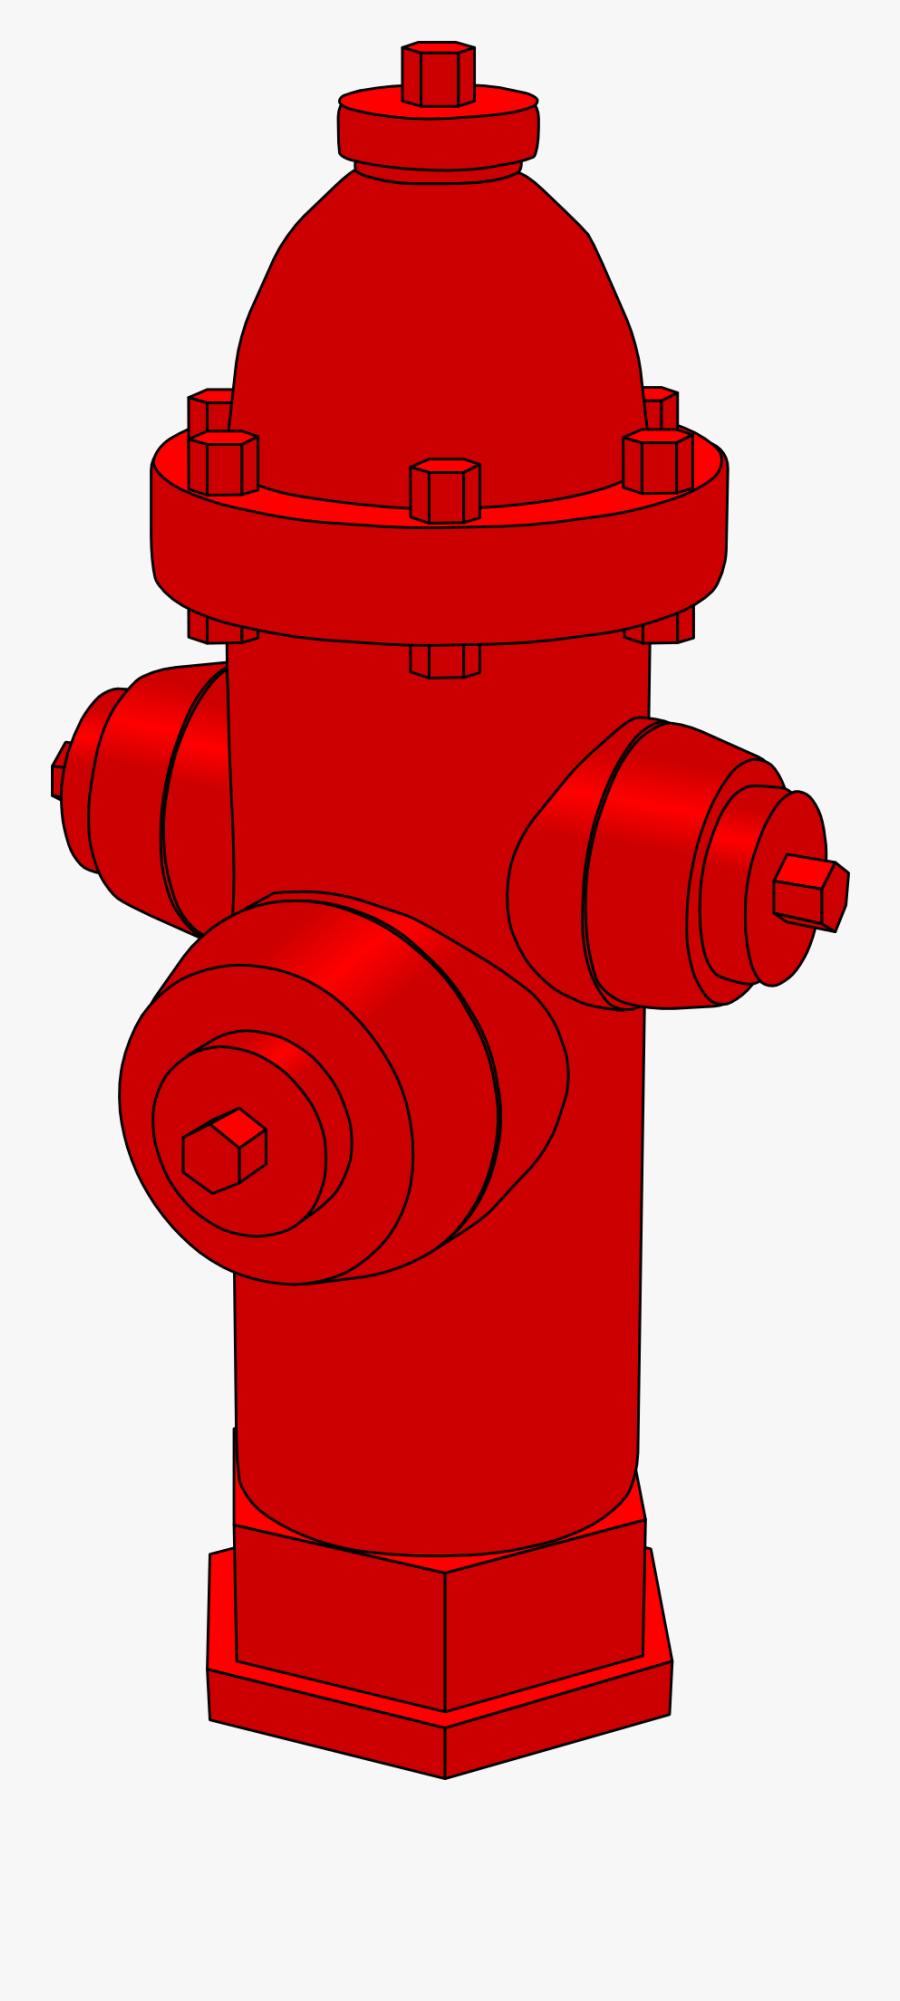 Hydrant Definition, Transparent Clipart